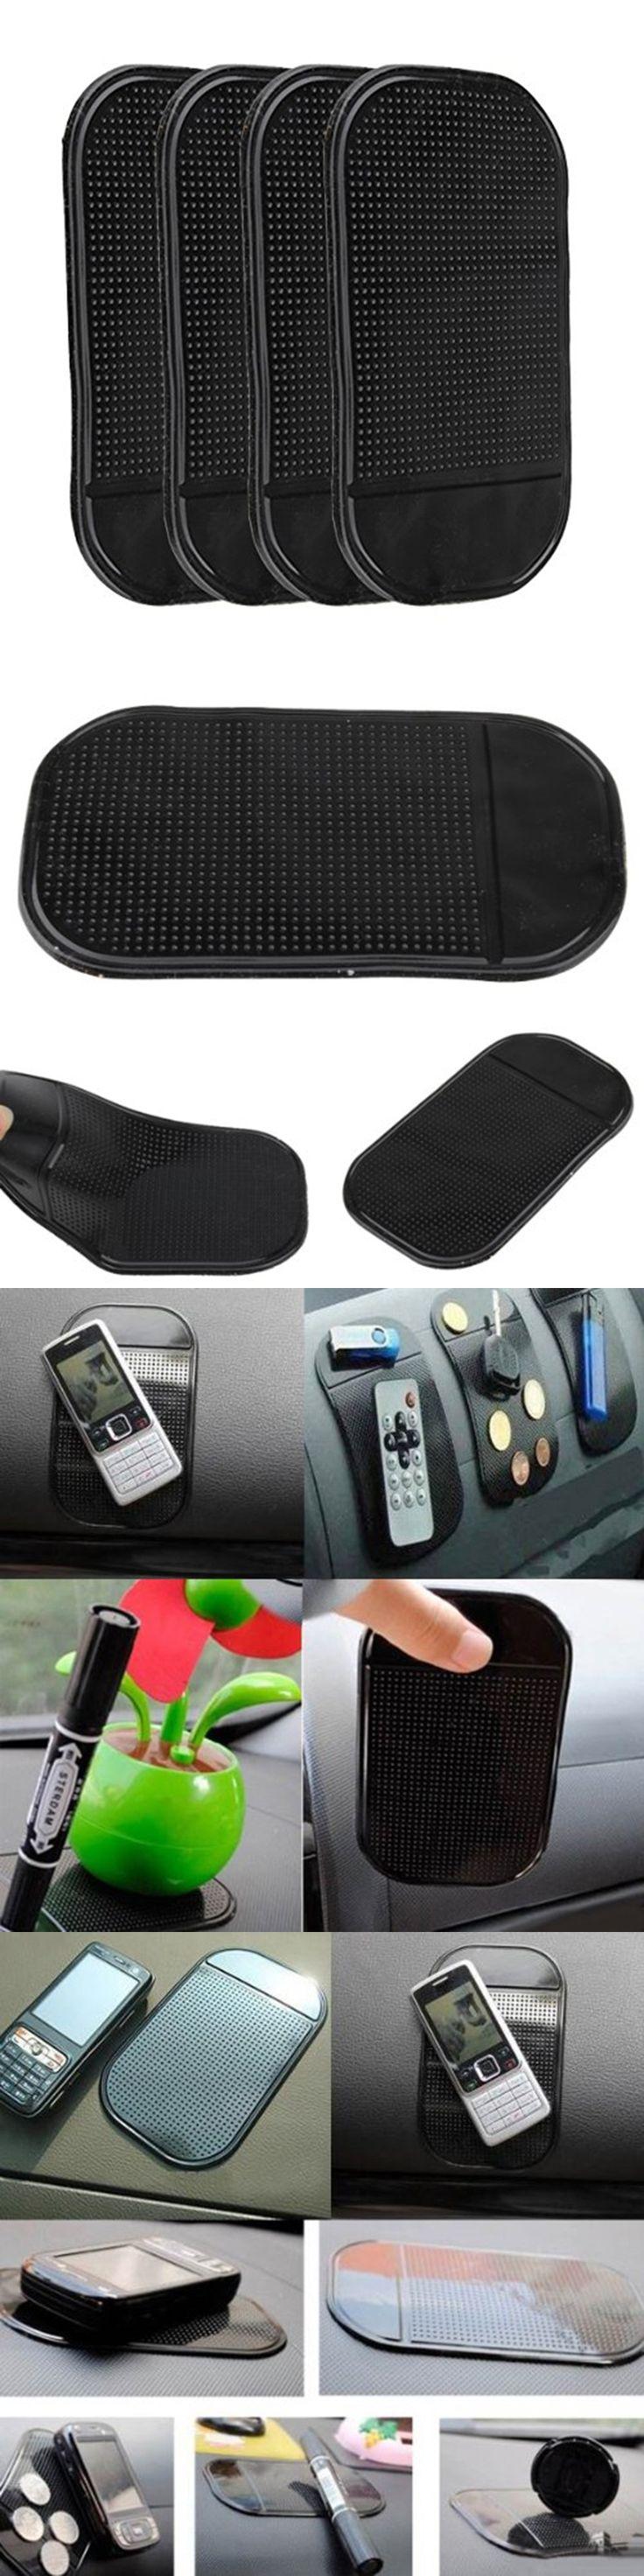 4 PCs Black Magic Sticky Pad Anti Slip Mat Car Dashboard for Cell Phone